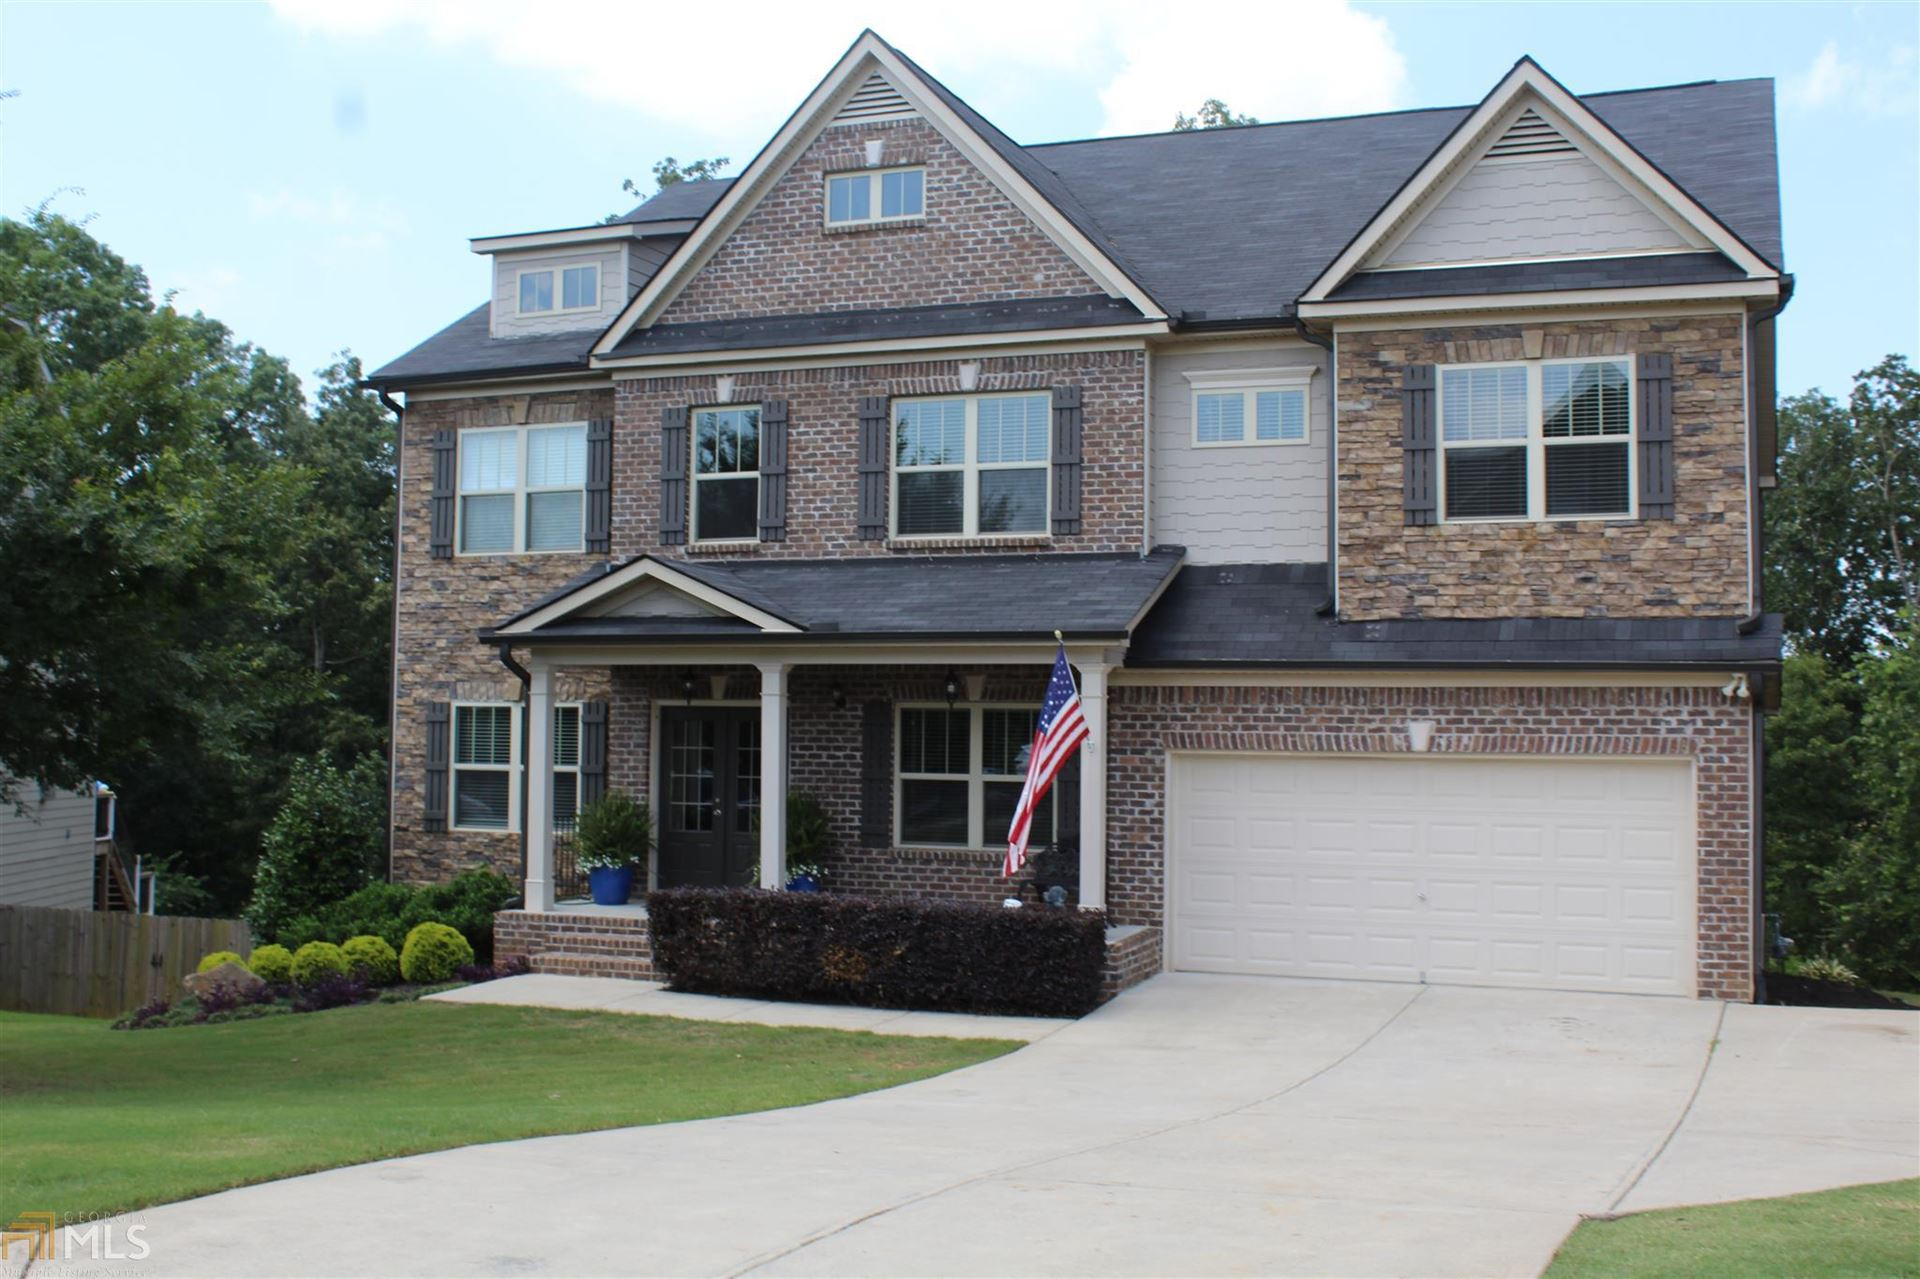 4285 Hopewell Manor Dr, Cumming, GA 30028 - MLS#: 8817224